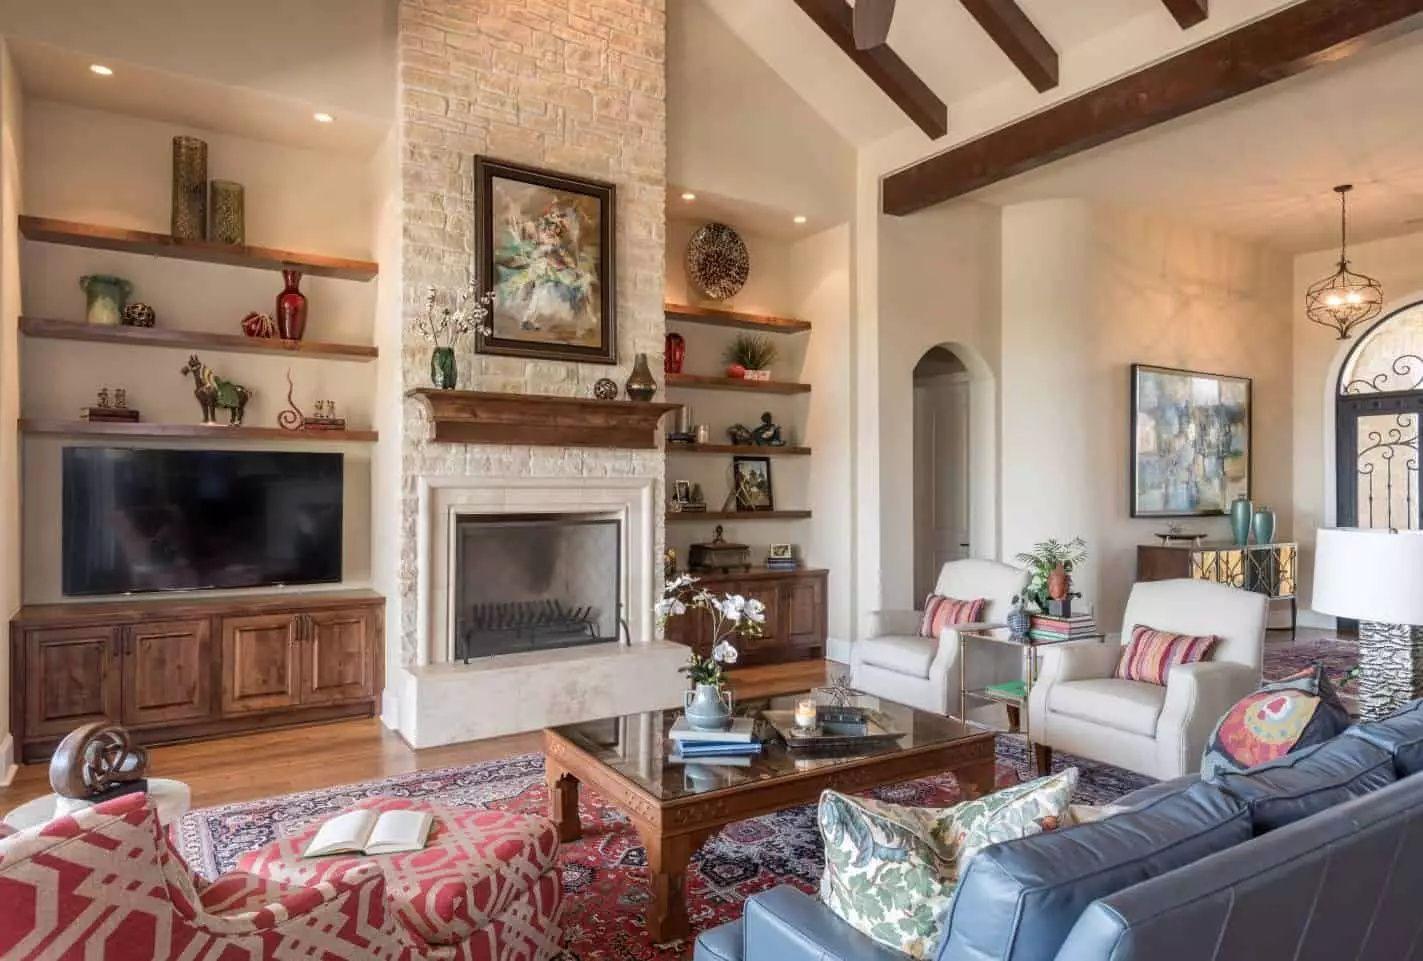 50 Spanish Style Living Room Ideas Photos Spanish Style Decor Spanish Home Decor Spanish Living Room #spanish #style #decorating #living #room